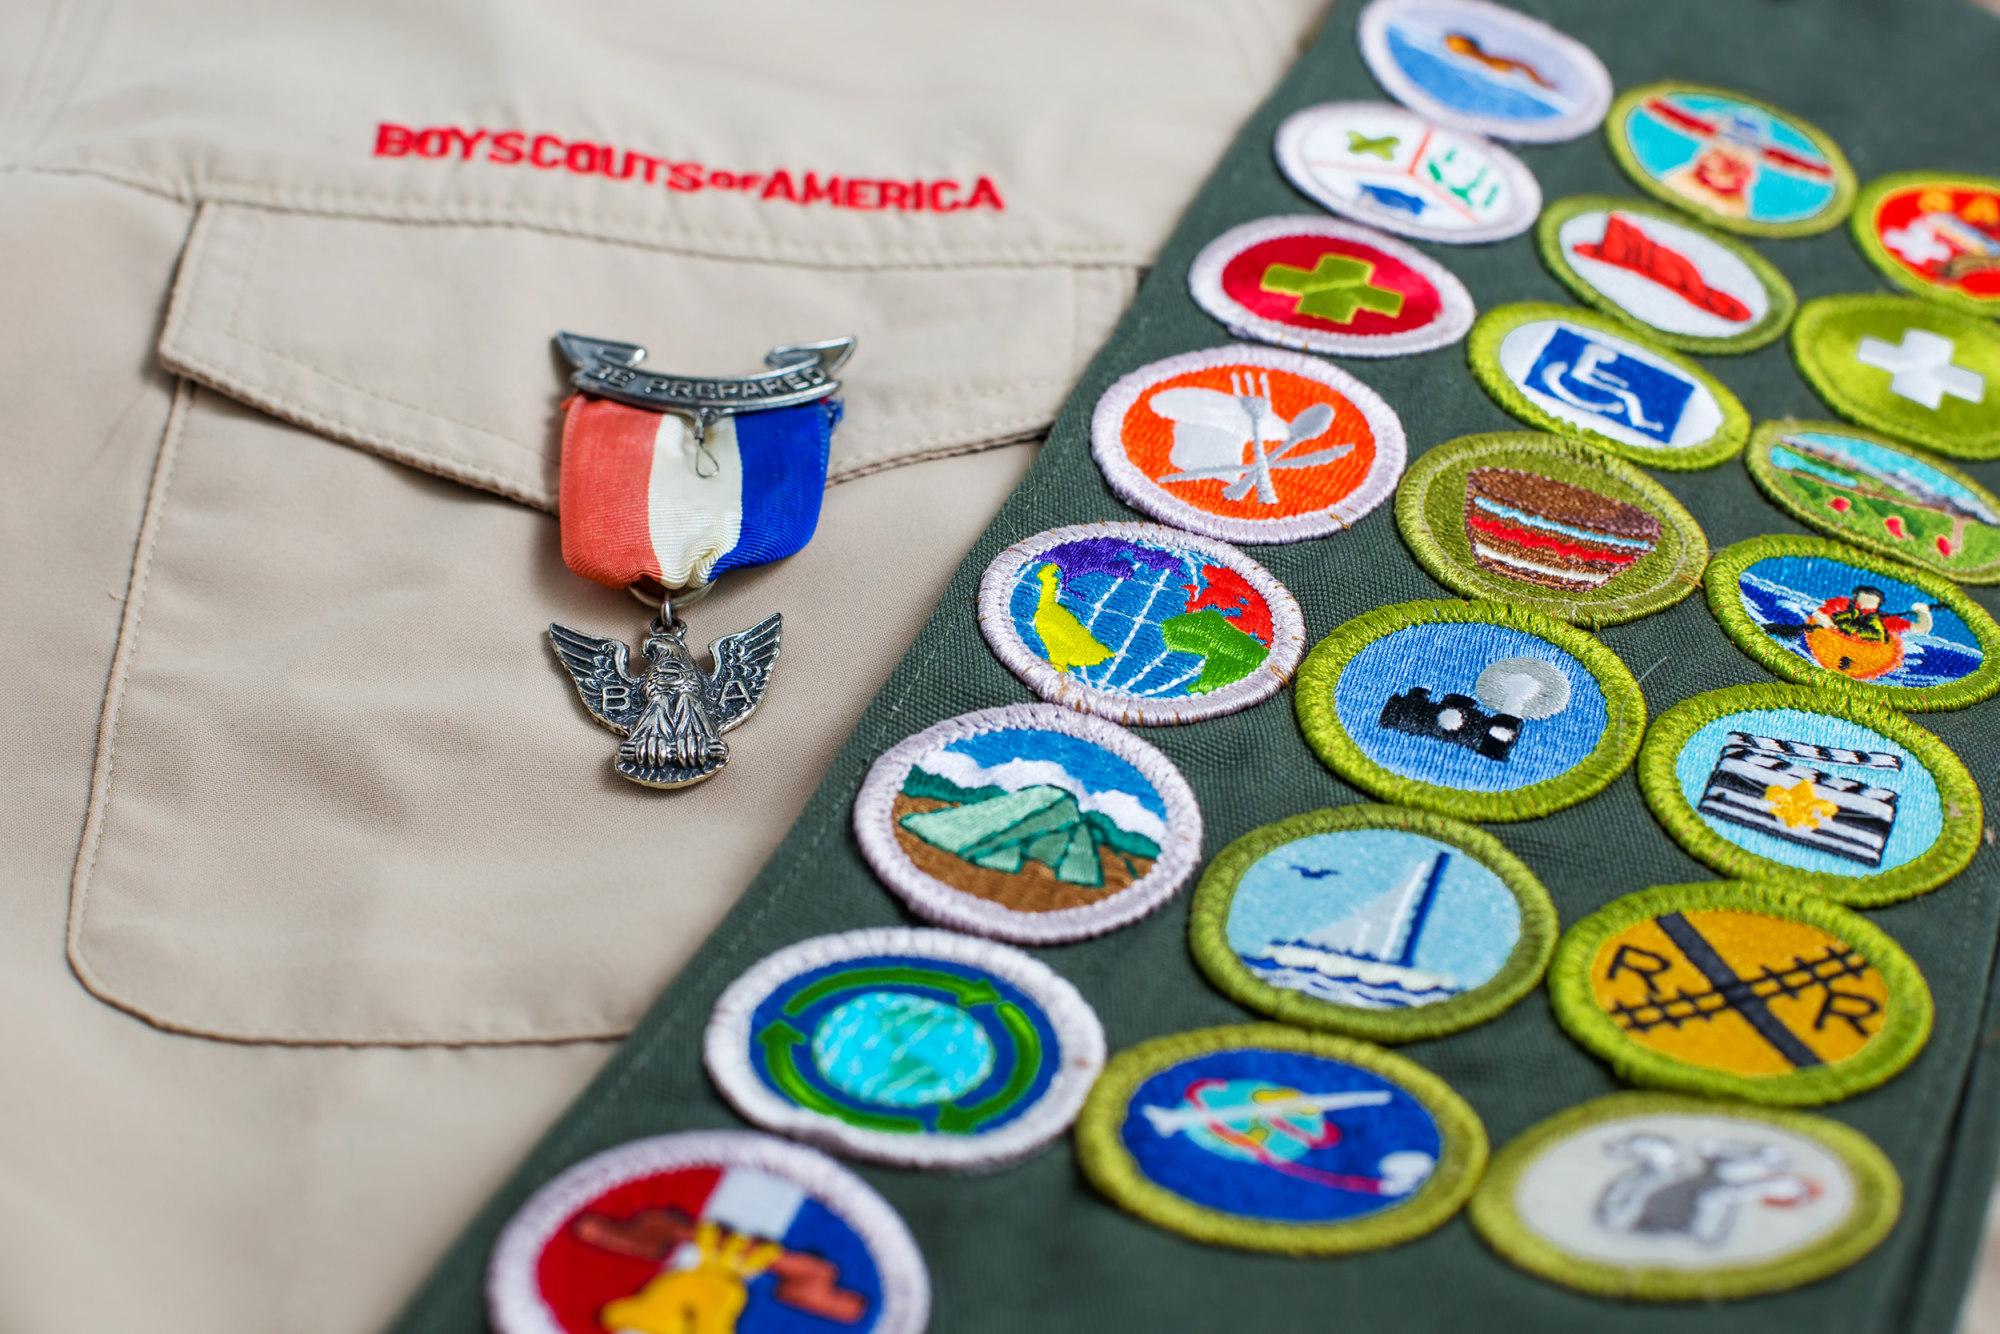 Eagle pin and merit badge sash on boy scout uniform